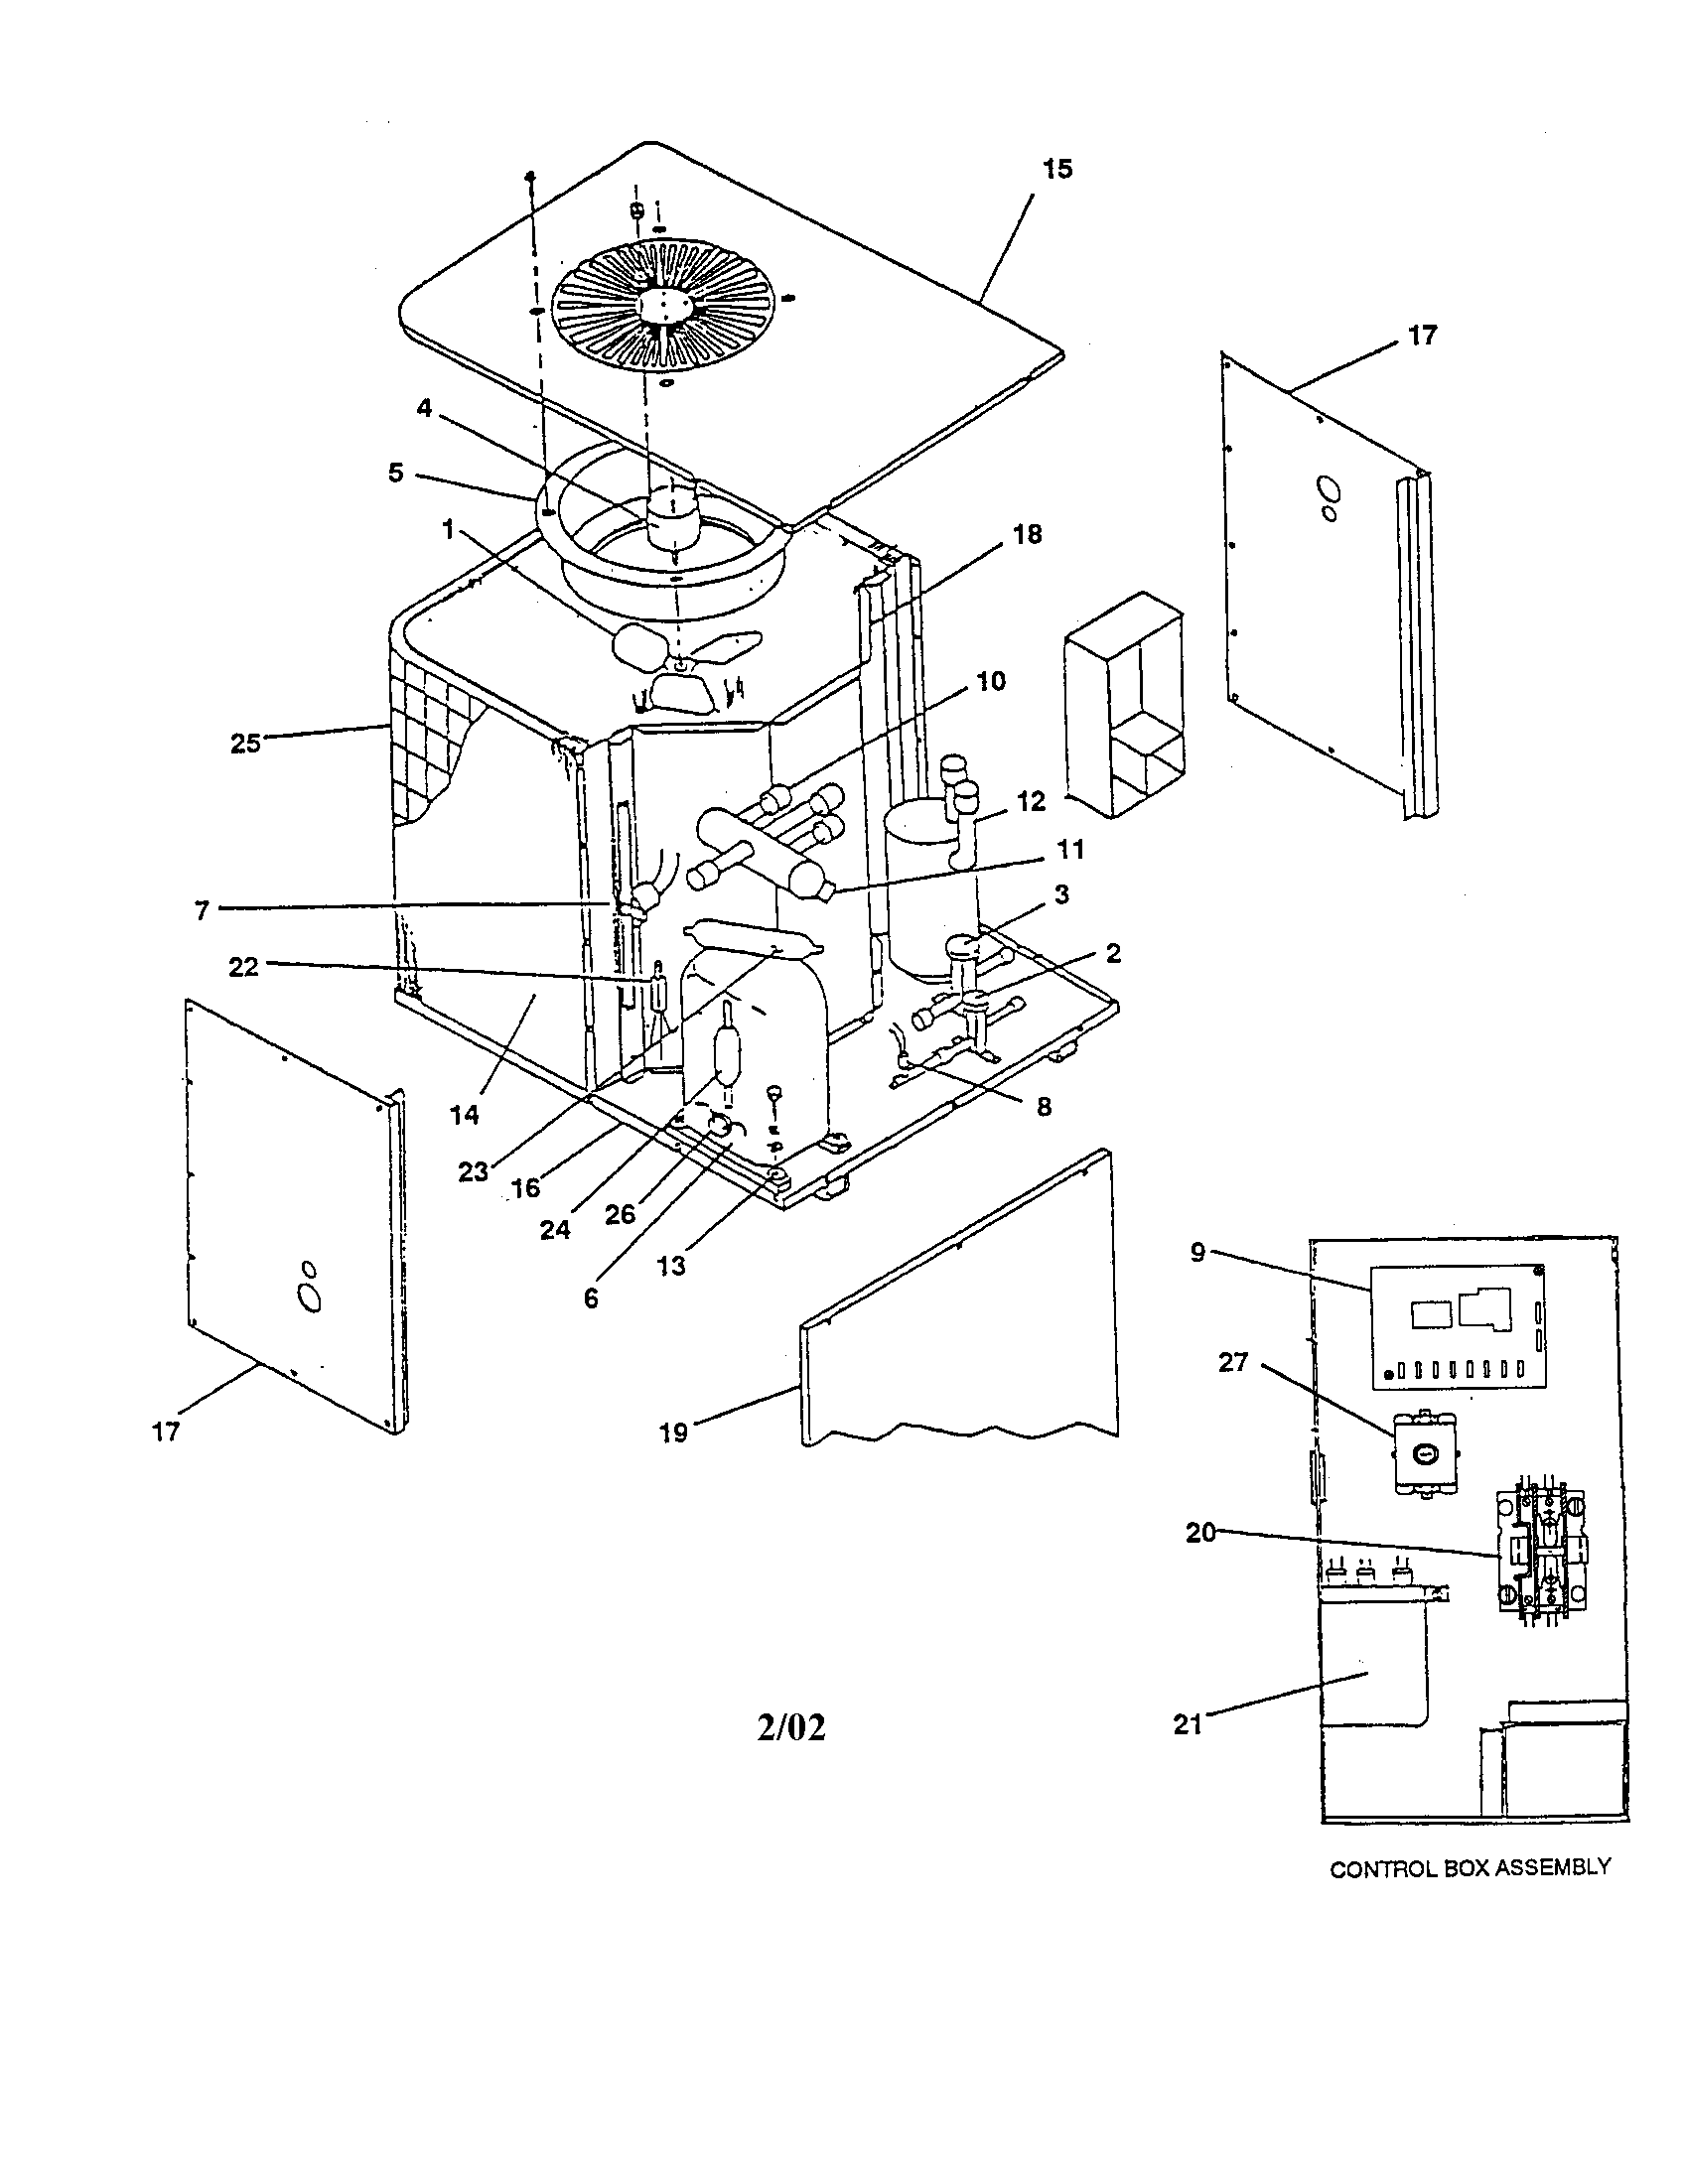 Goodman model CPE48-1FB air-conditioner/heat pump(outside